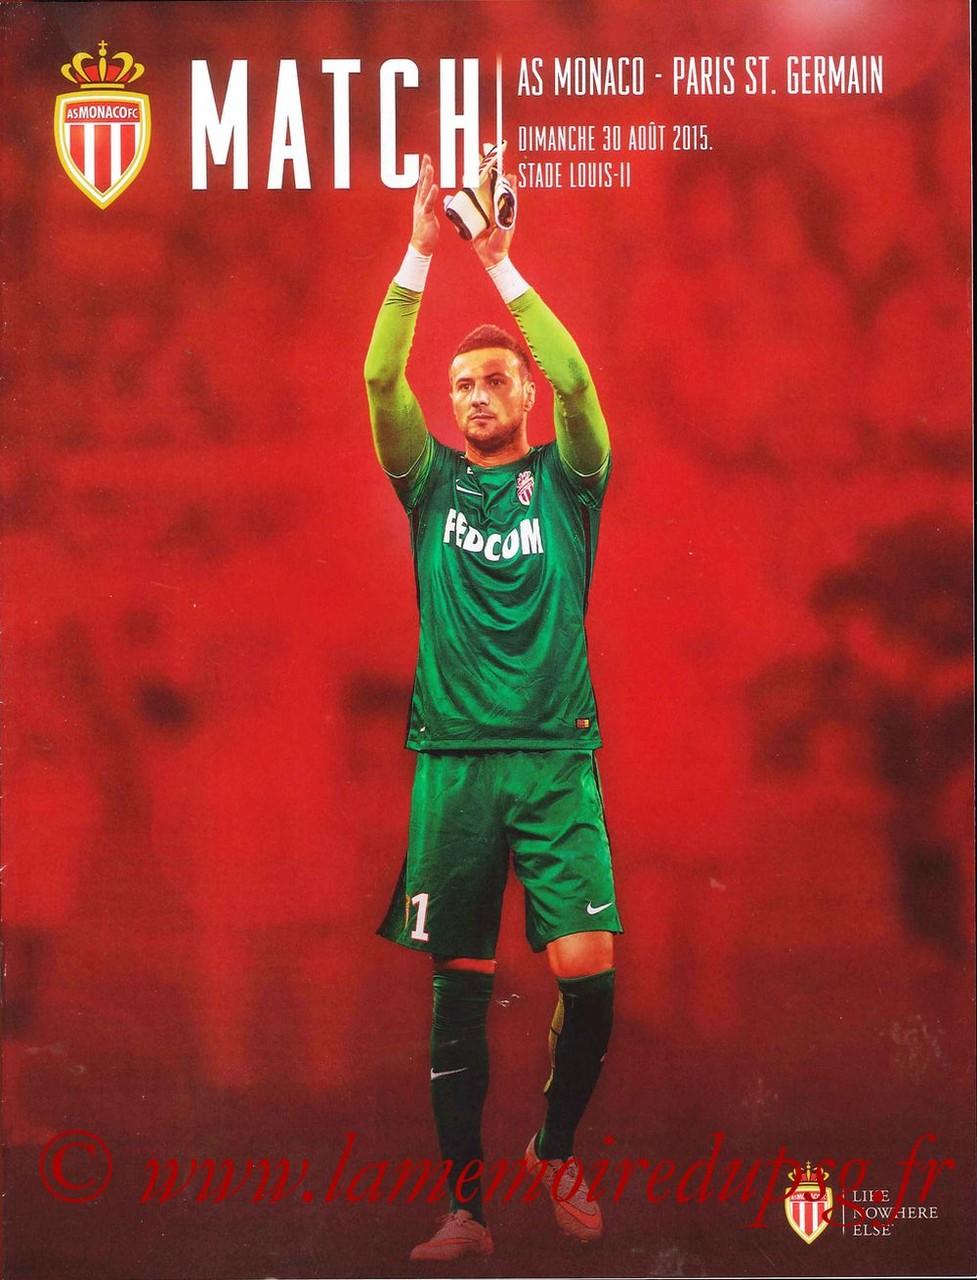 2015-08-30  Monaco-PSG (4ème L1, Match)